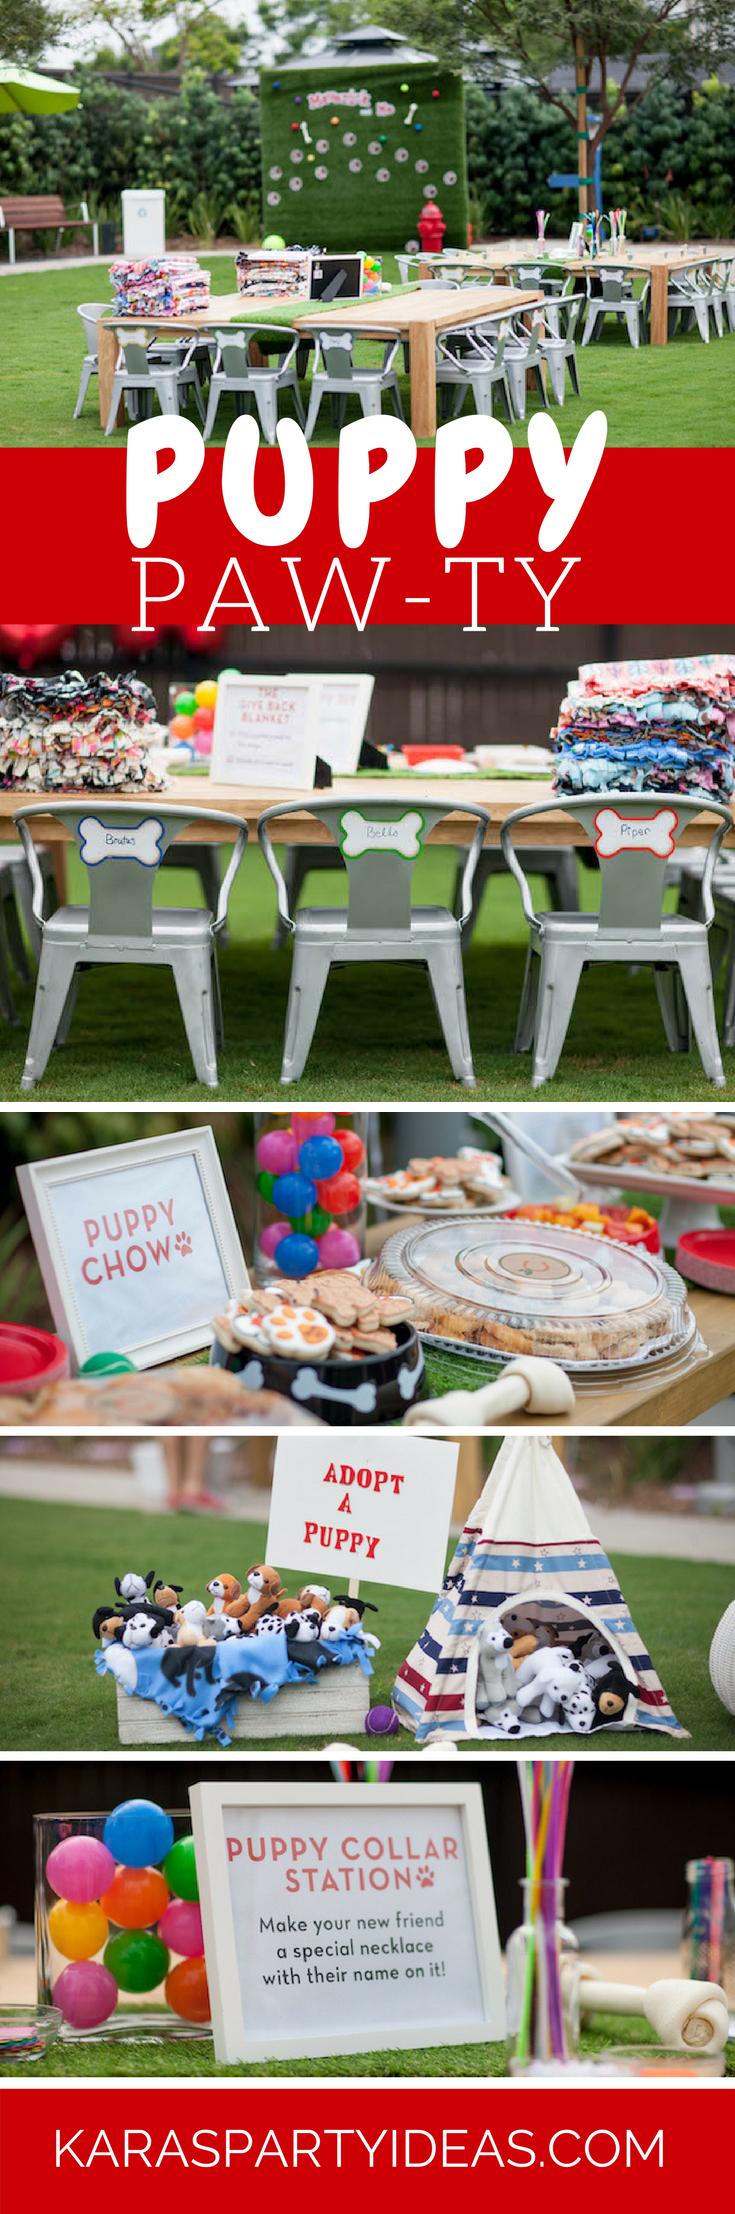 Puppy Paw-ty via Kara's Party Ideas - KarasPartyIdeas.com